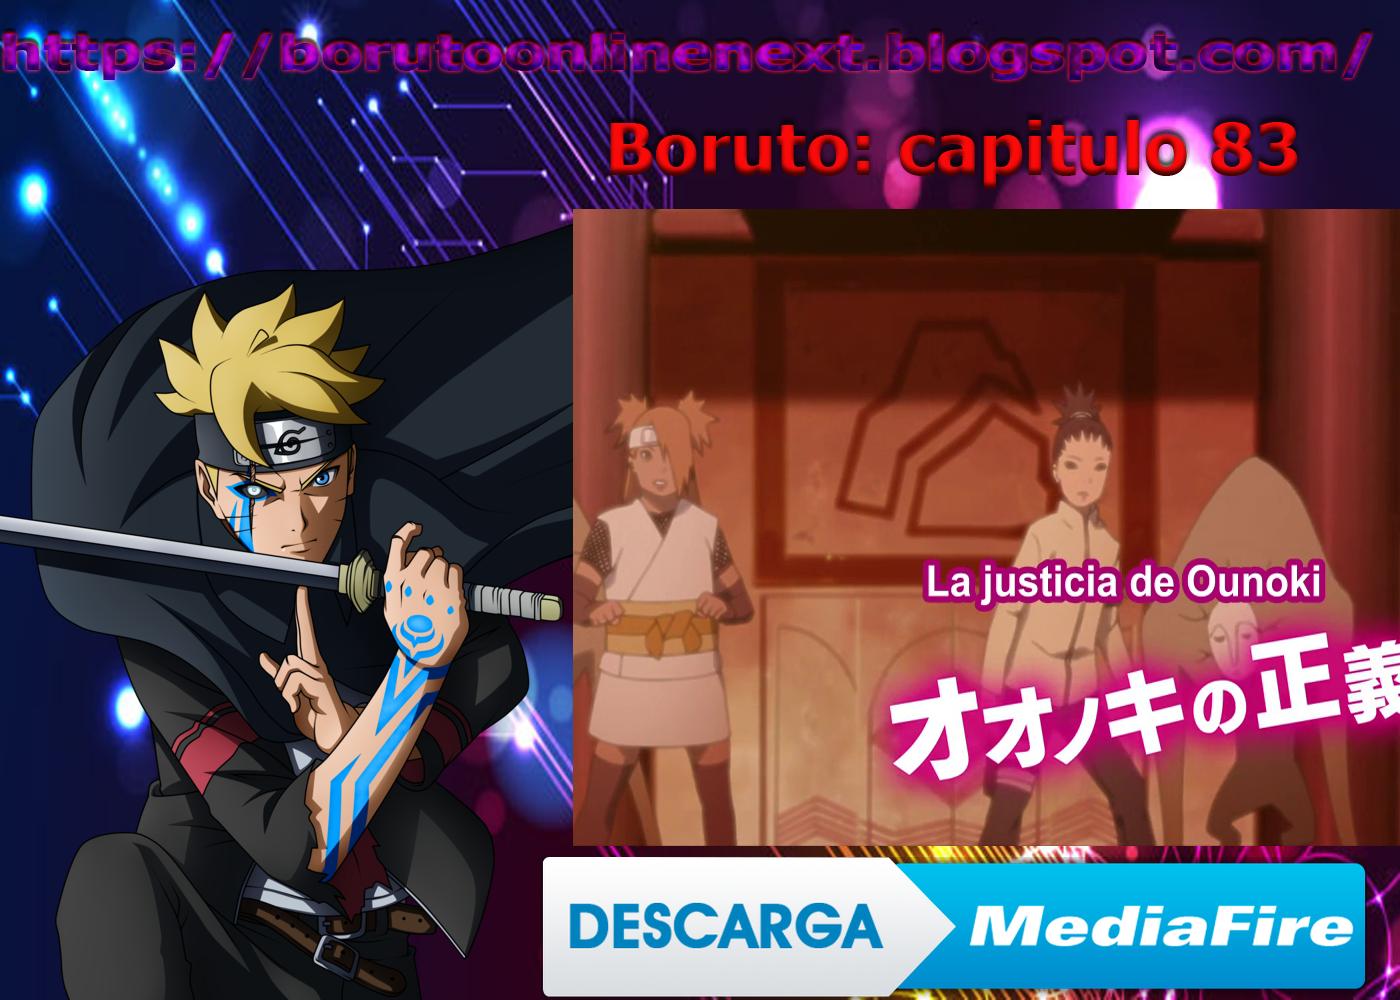 Boruto Capitulo 83 Por Mediafire Boruto Naruto Justicia